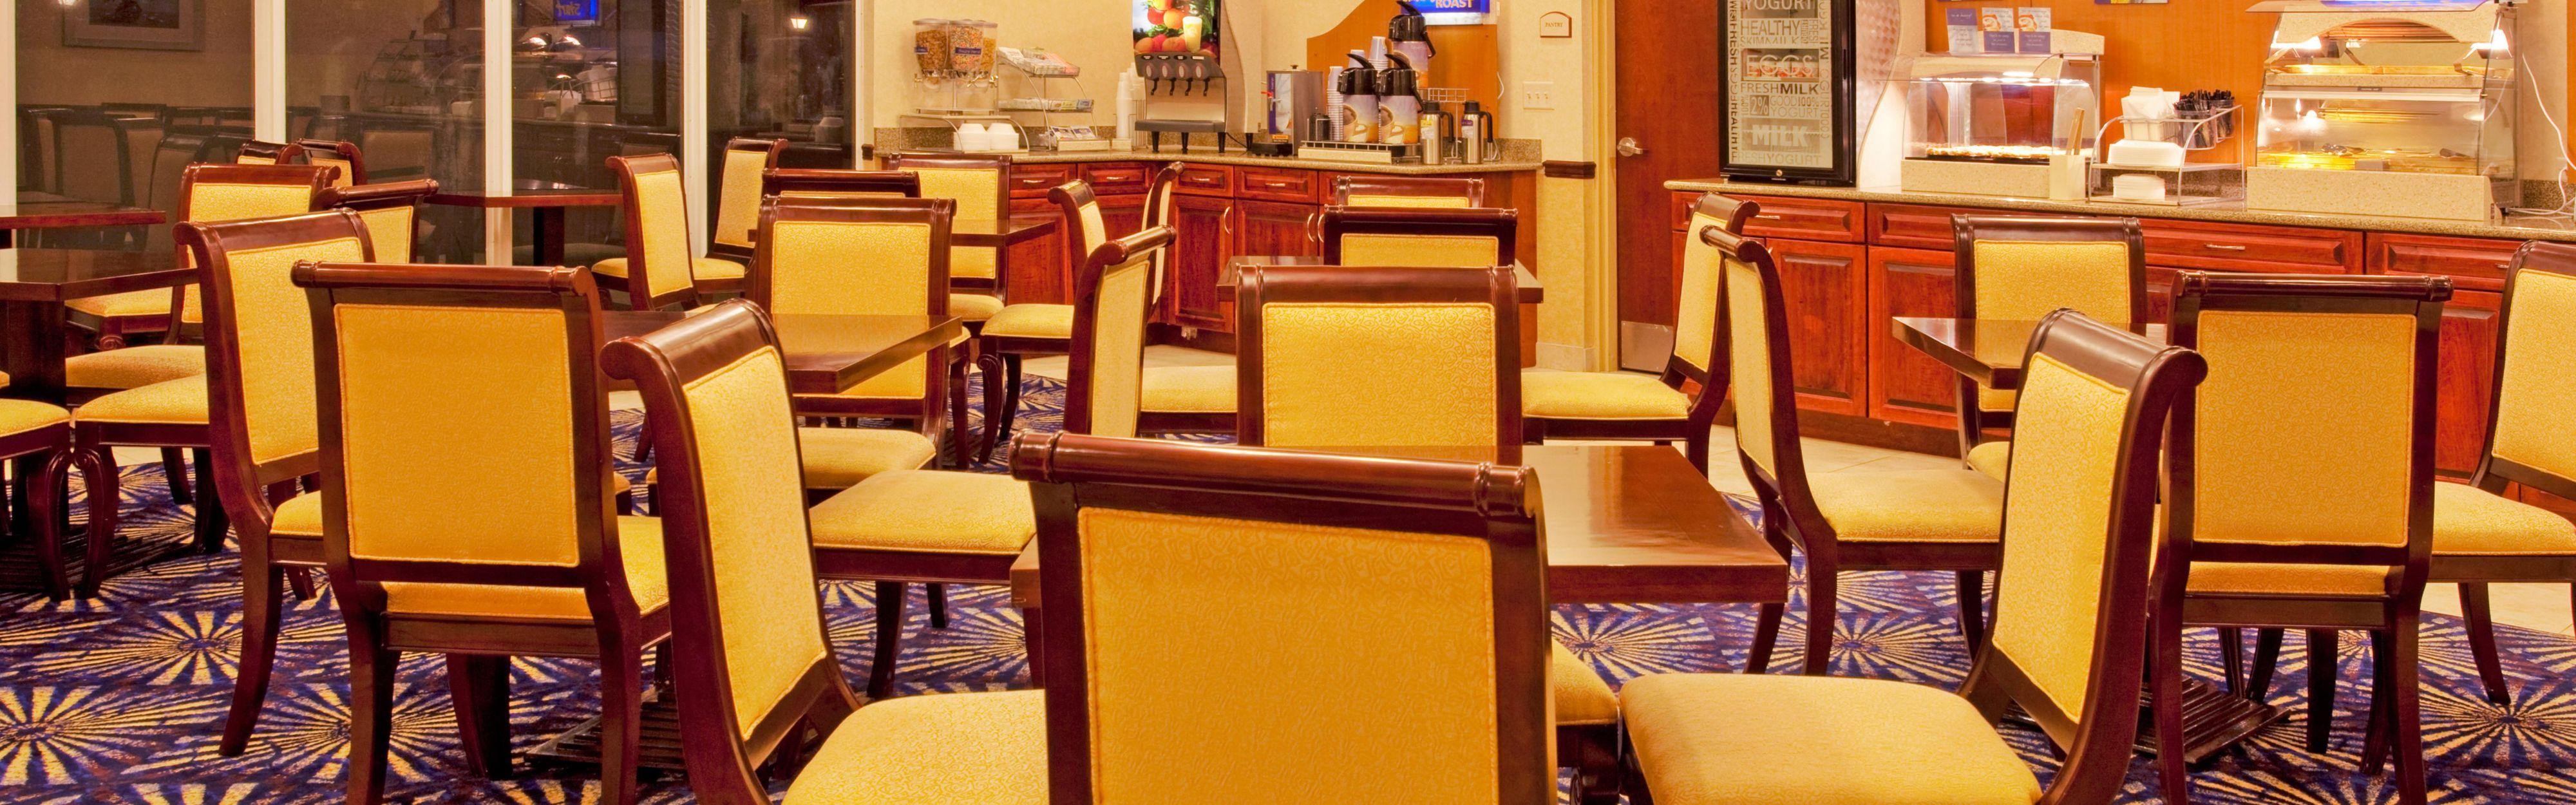 Holiday Inn Express & Suites Brooksville-I-75 image 3